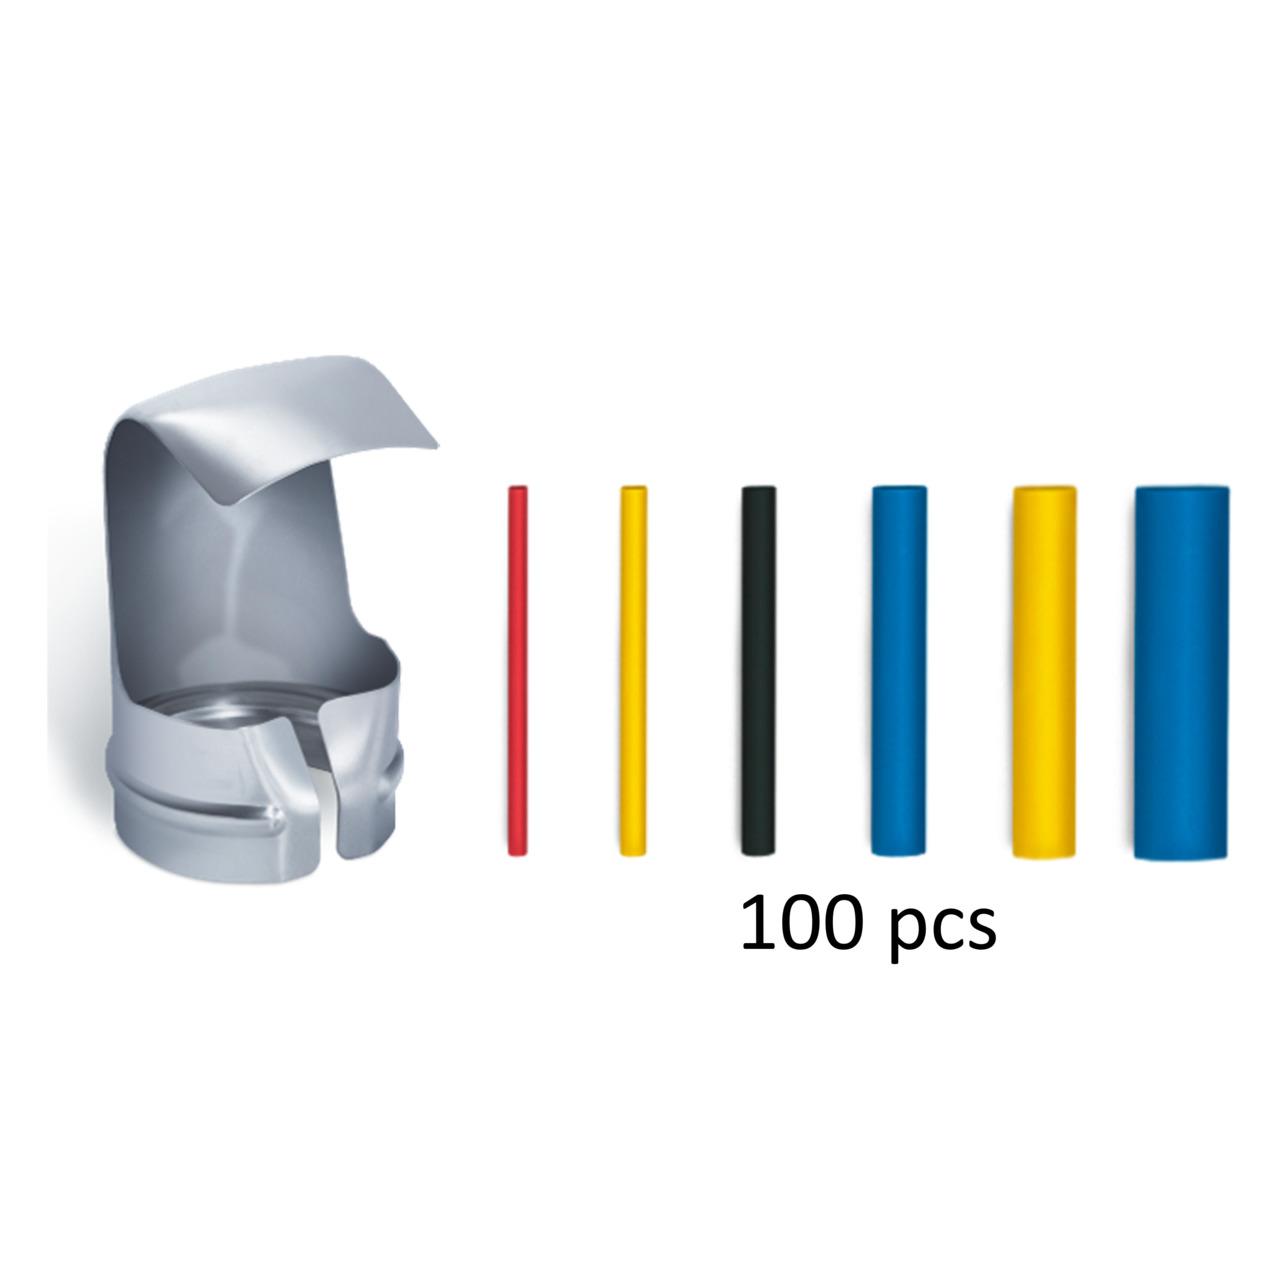 Steinel Shrink Tubing Kit - Heat Shrink 100pcs - German quality